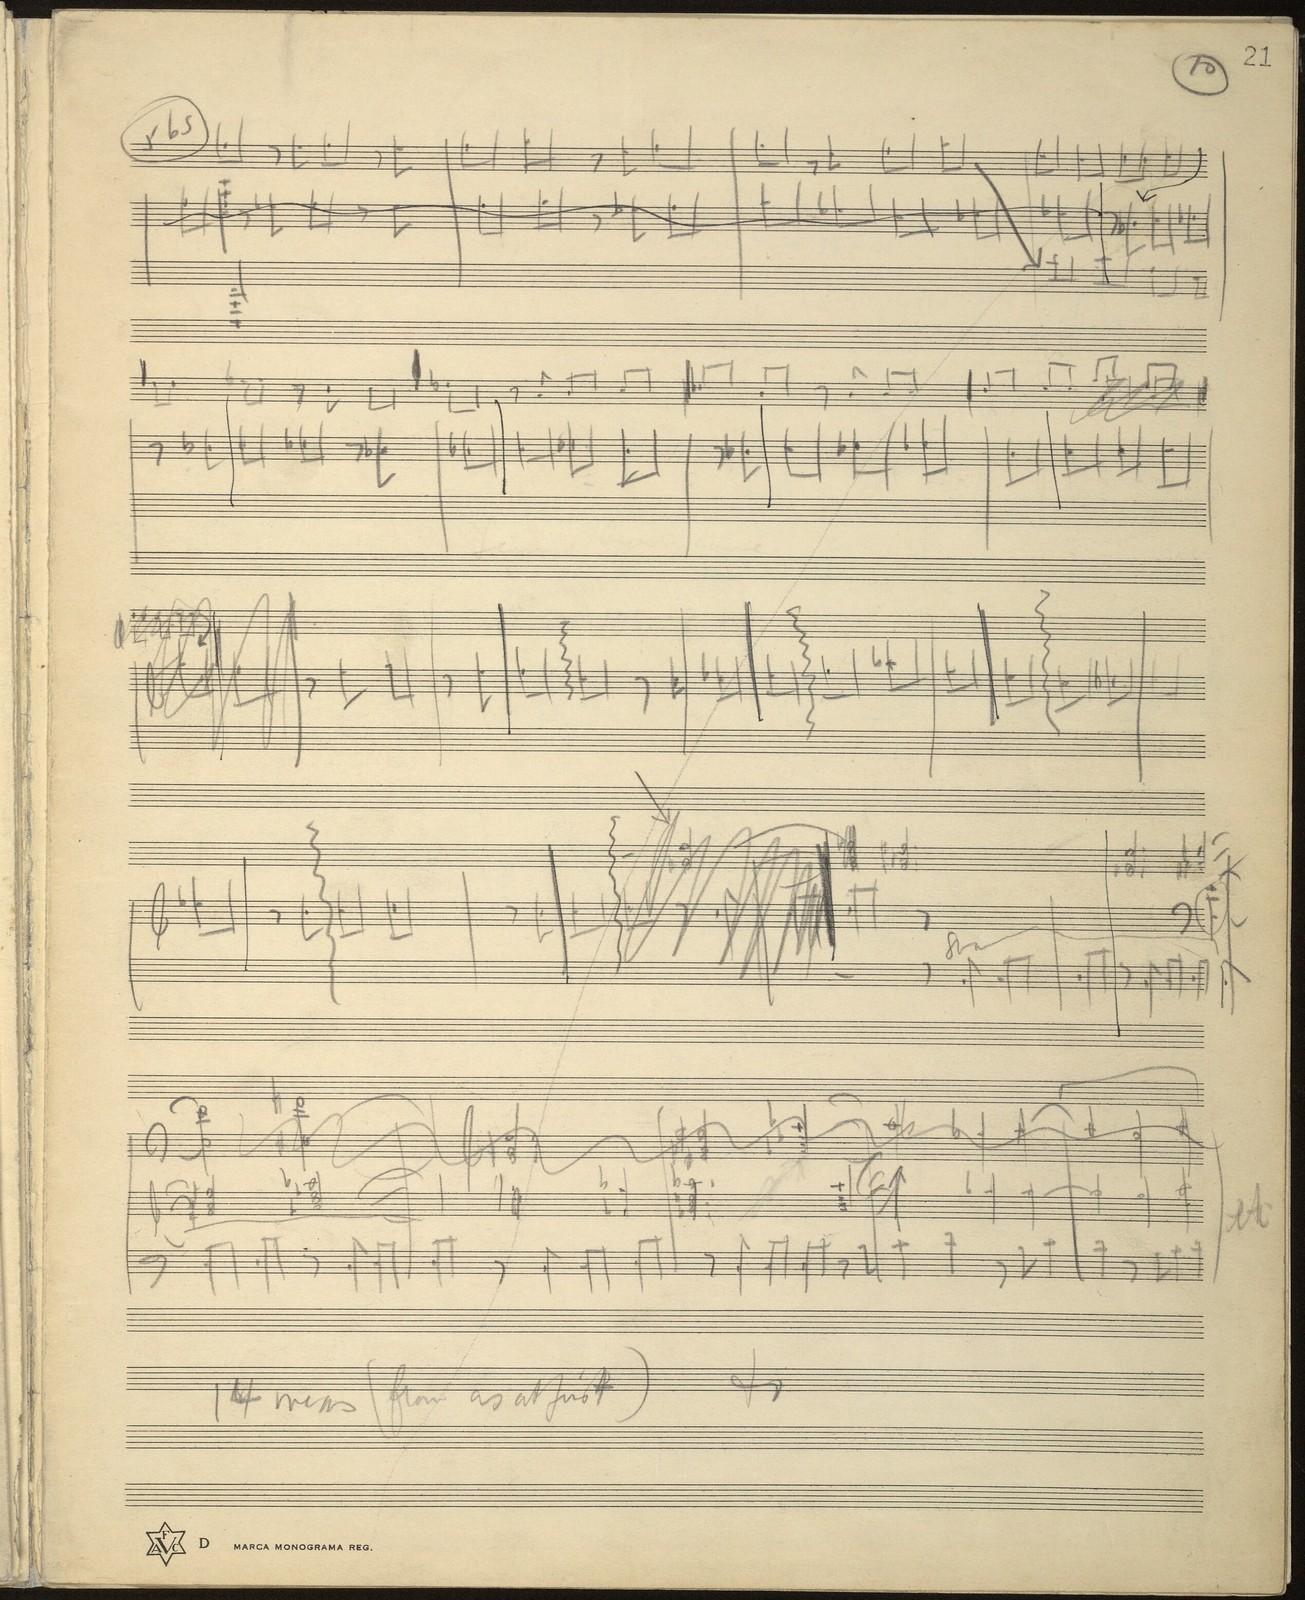 Music for Radio [open score pencil sketches]